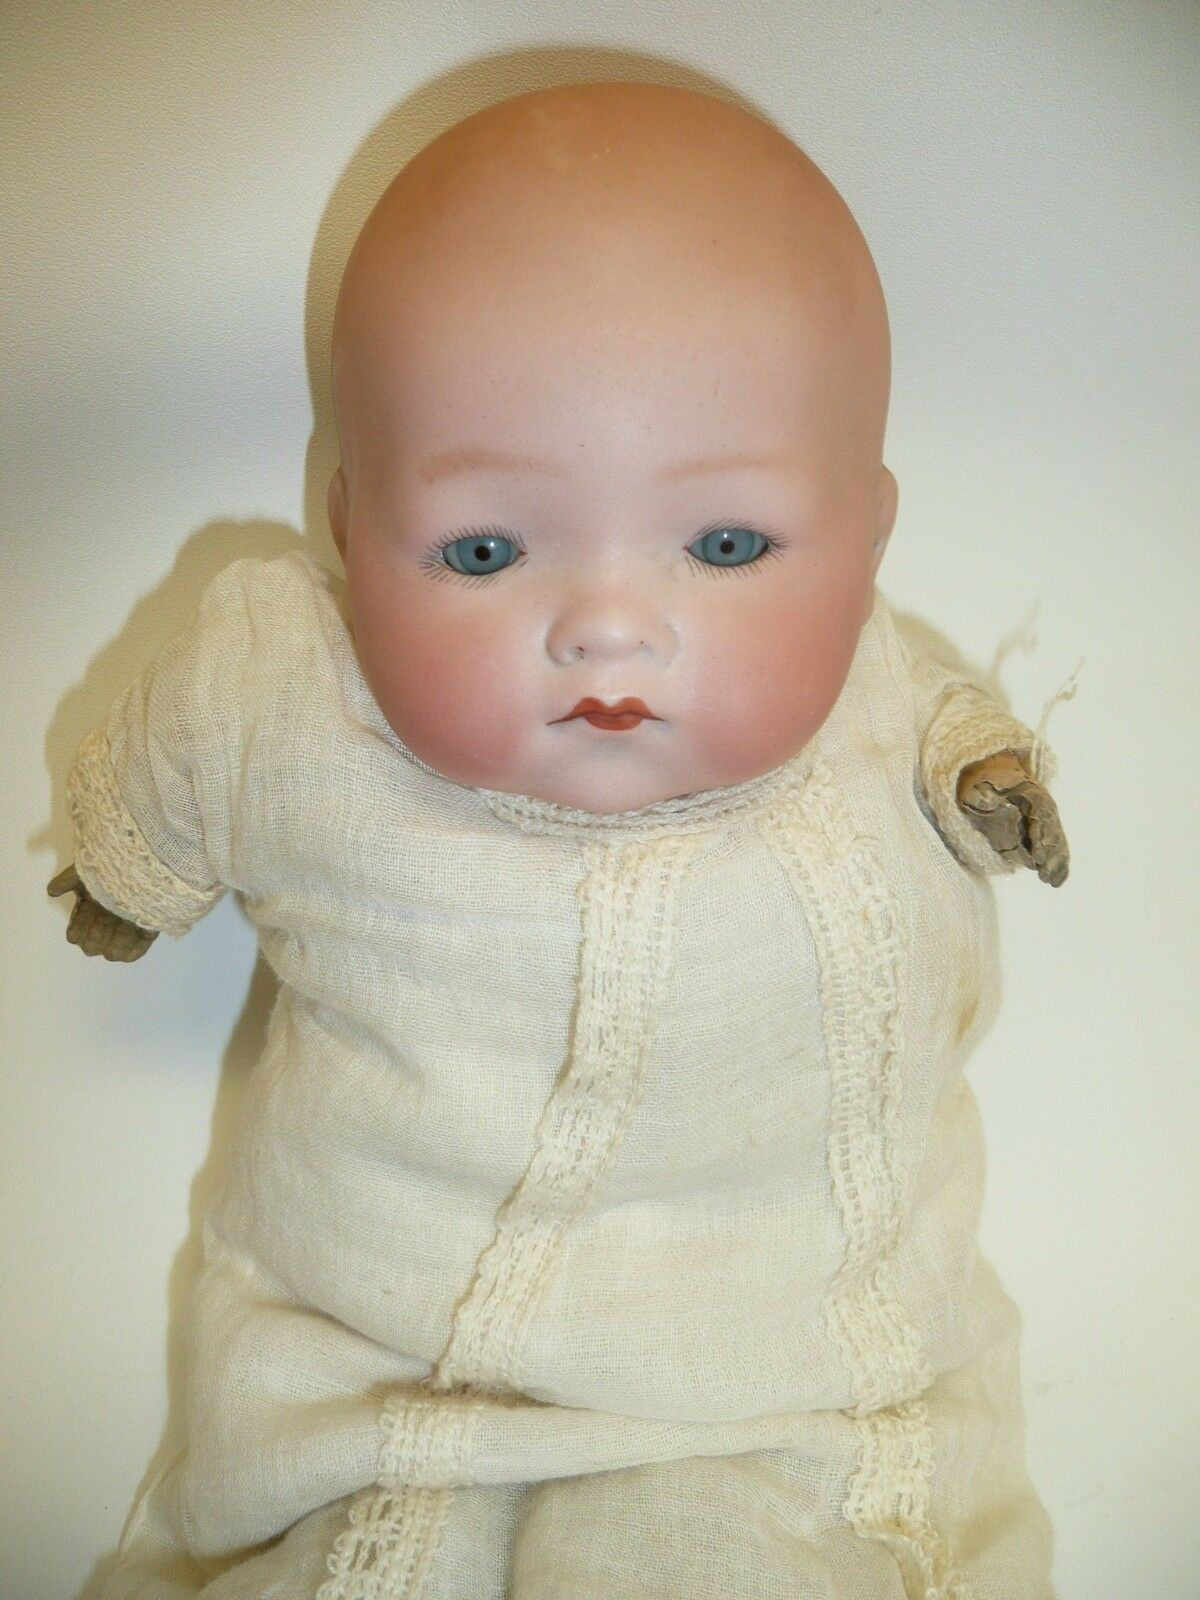 10  Geruomo Dream bambino AM  341 8 w blu Sleep Eyes, Original Dress & corpo 9  Circ.  a prezzi accessibili